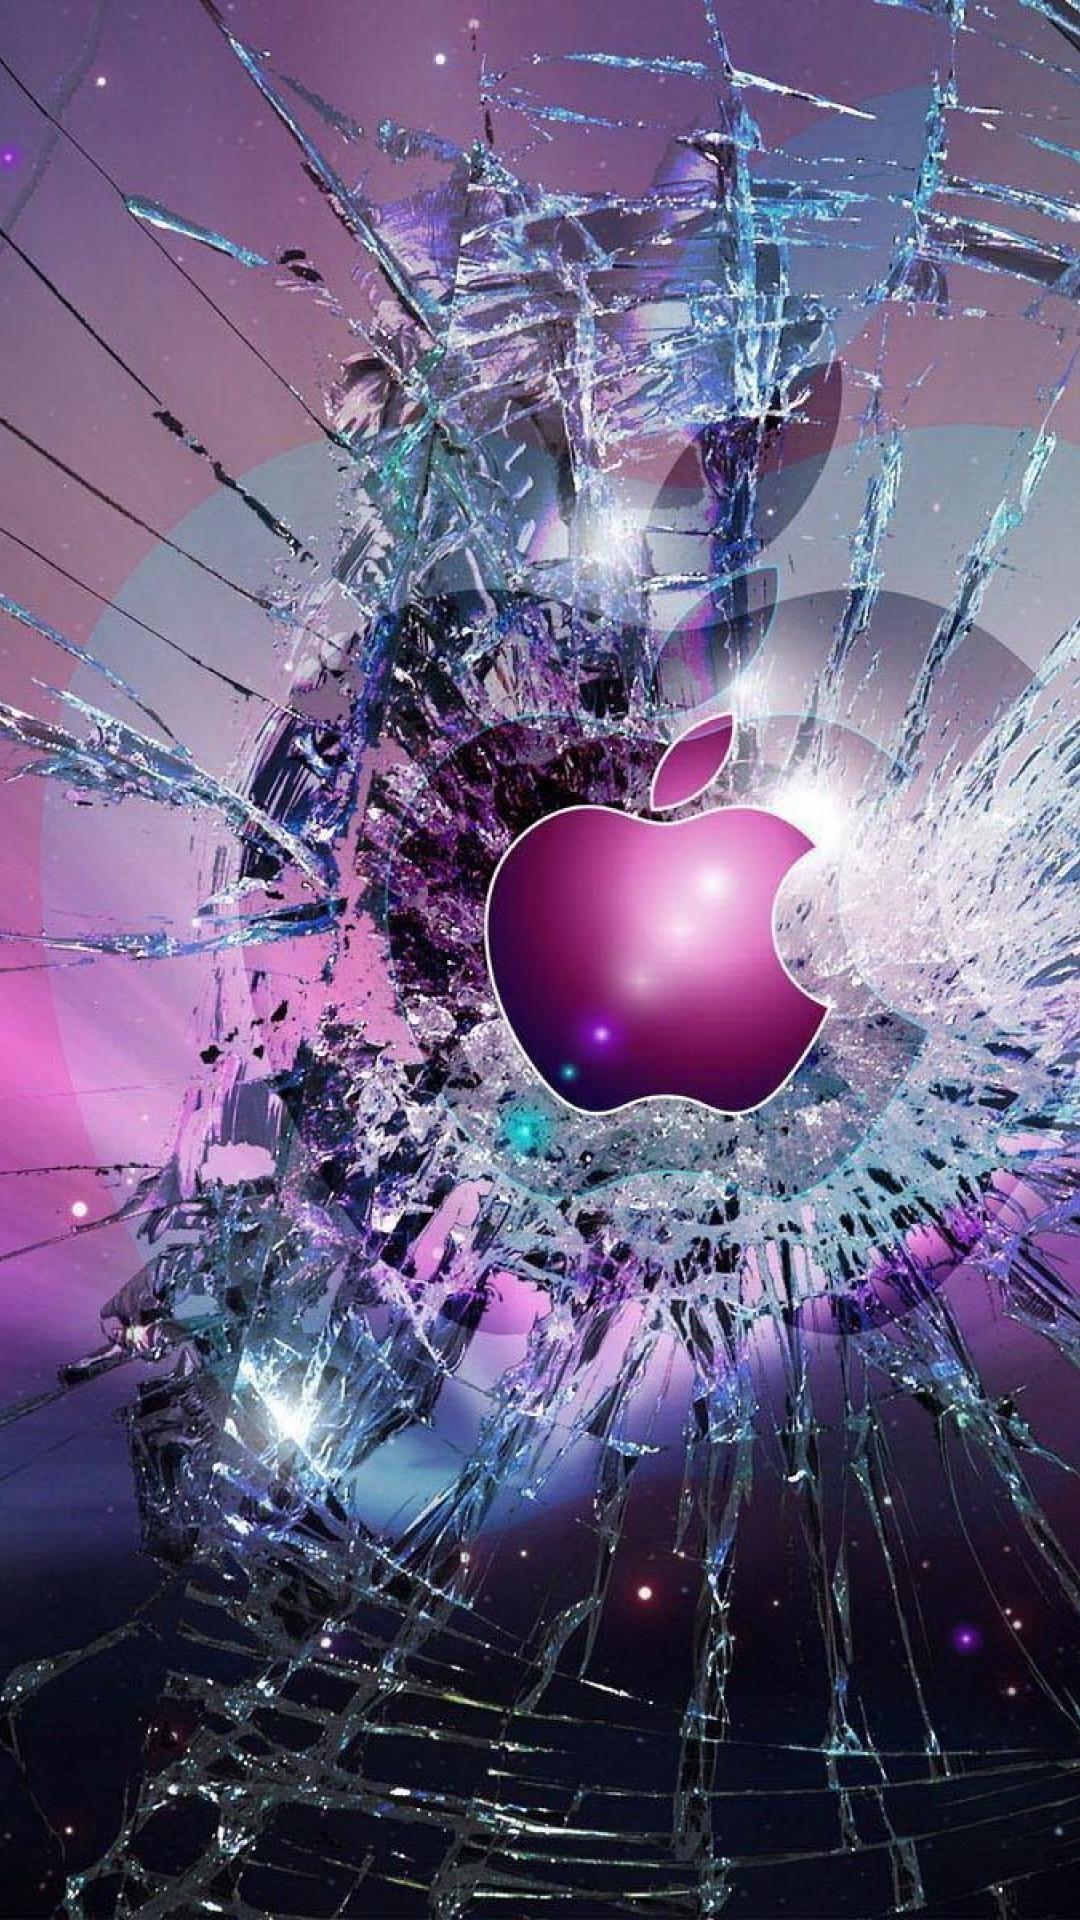 cool-lock-screen-broken-glass-iphone-1080x1920-wallpaper-wpc920194